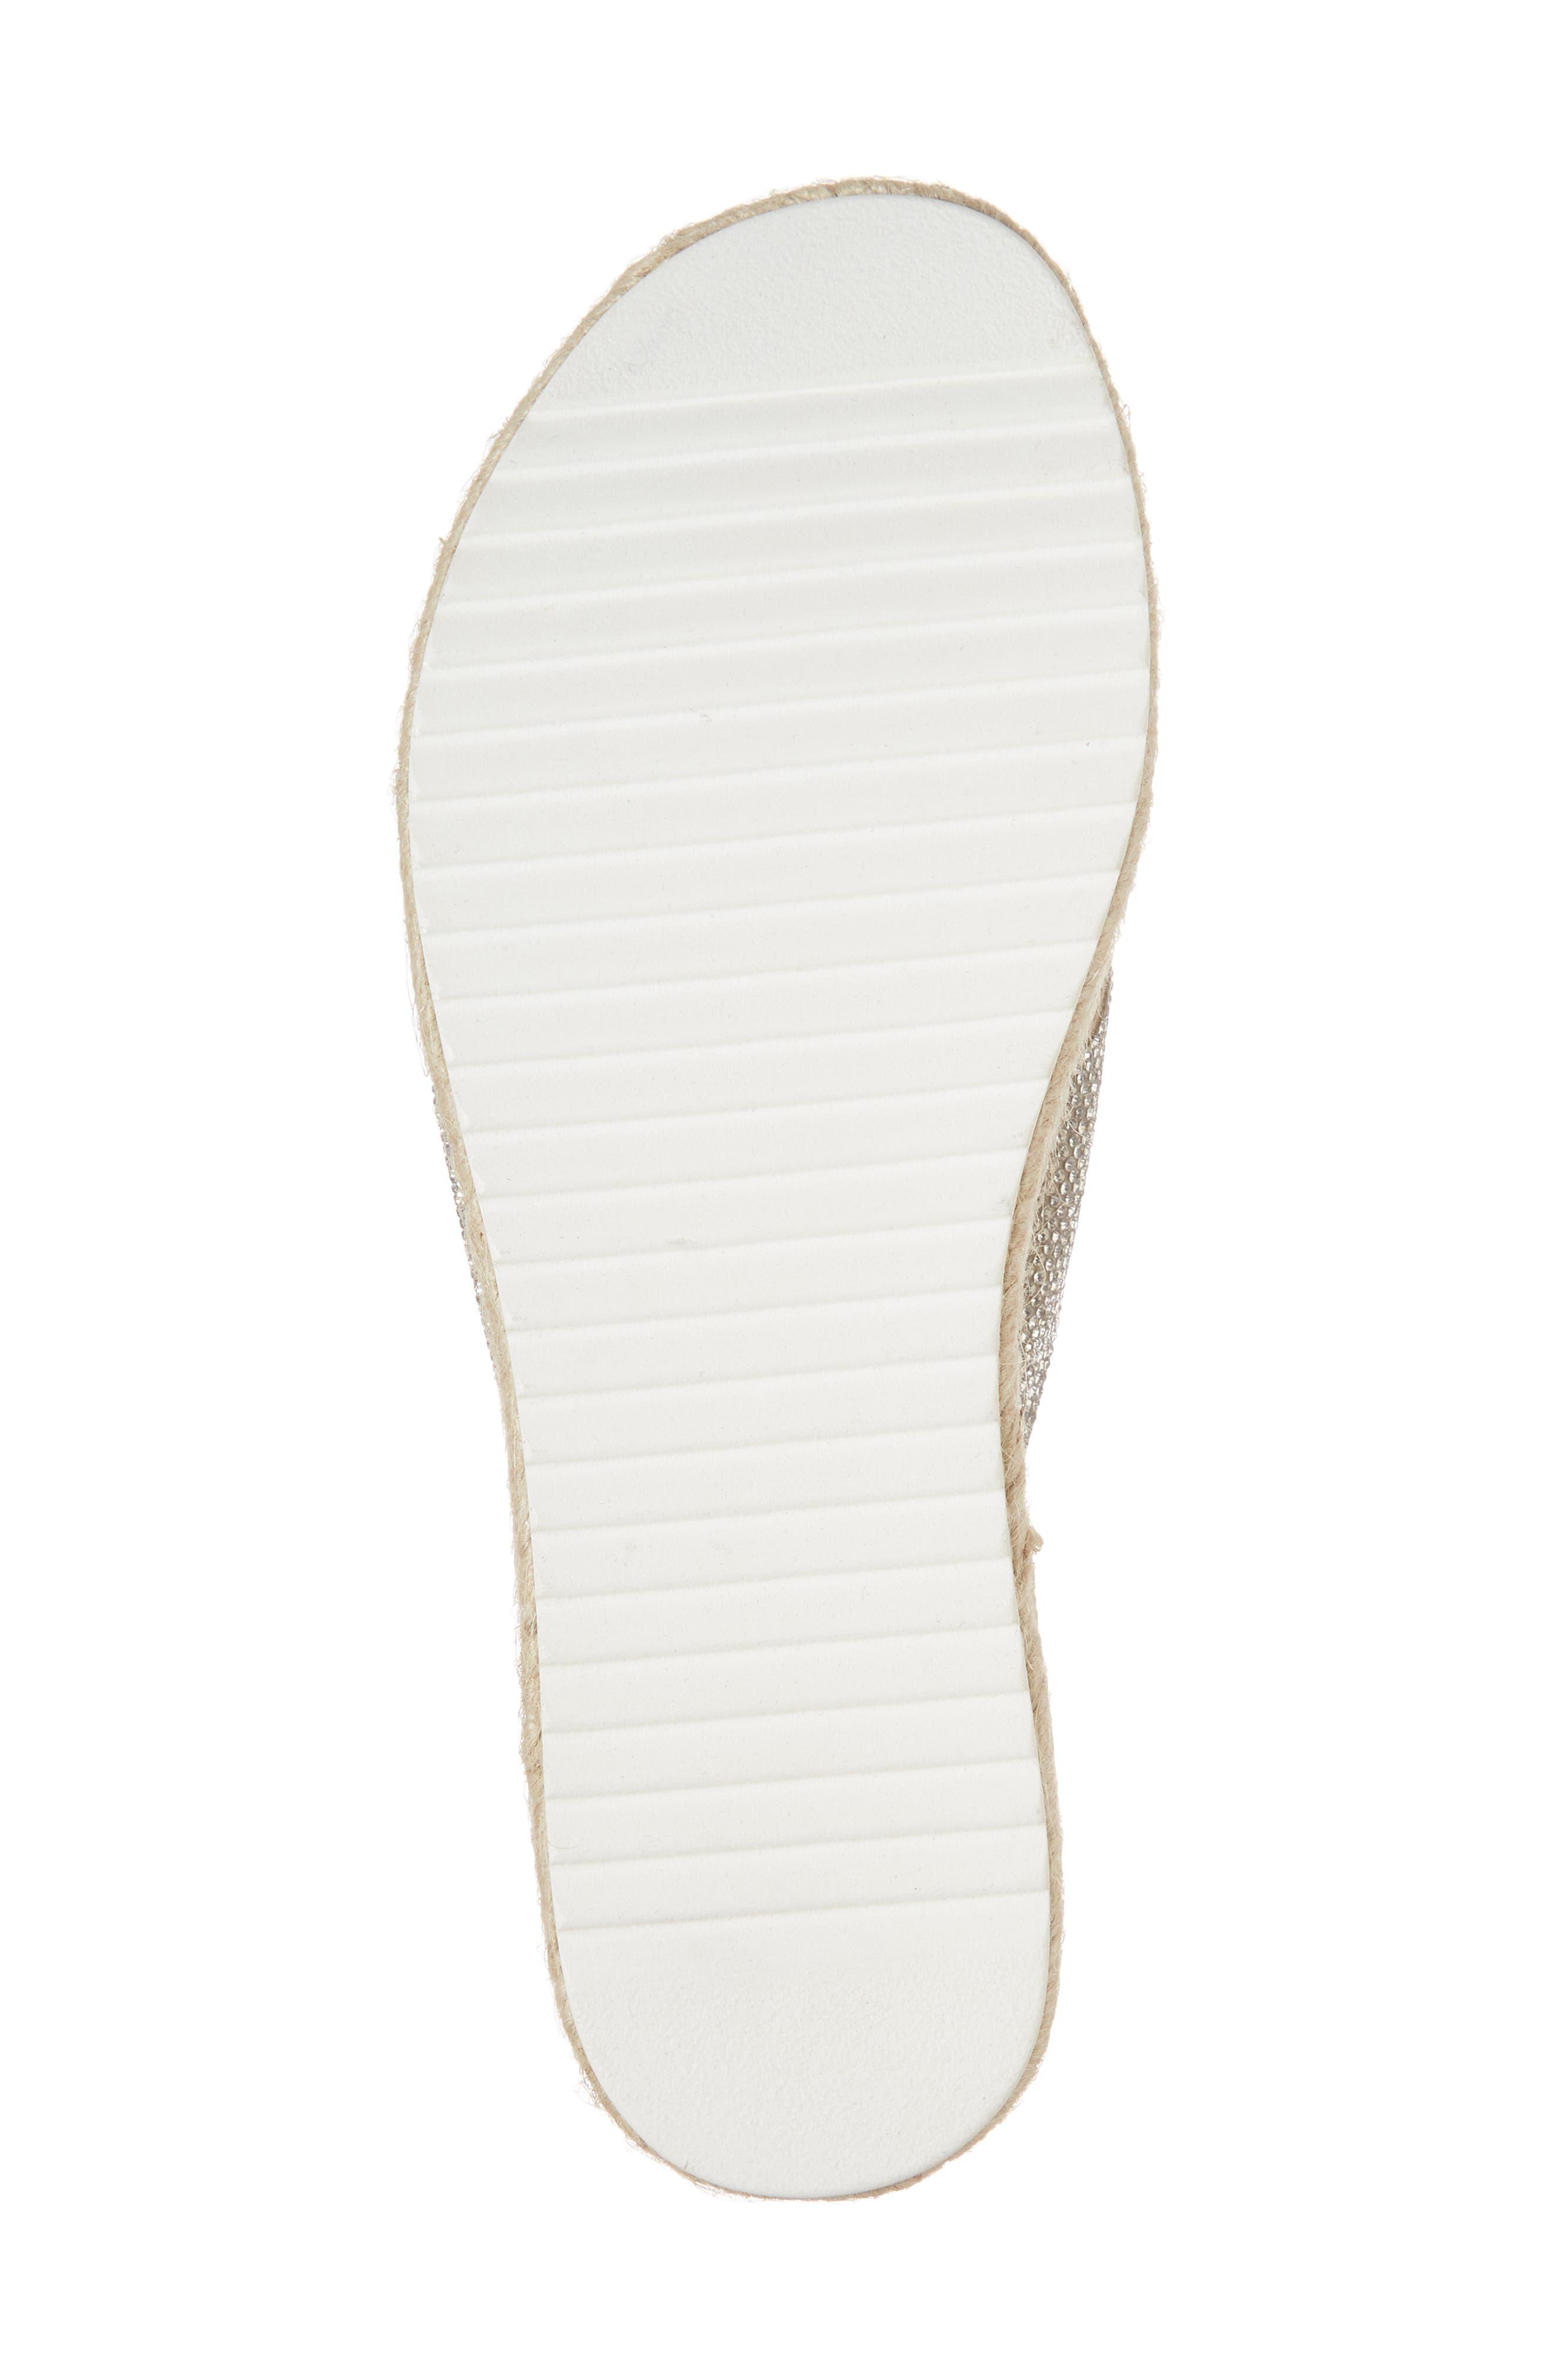 Arran-R Platform Espadrille Sandal,                             Alternate thumbnail 6, color,                             Silver